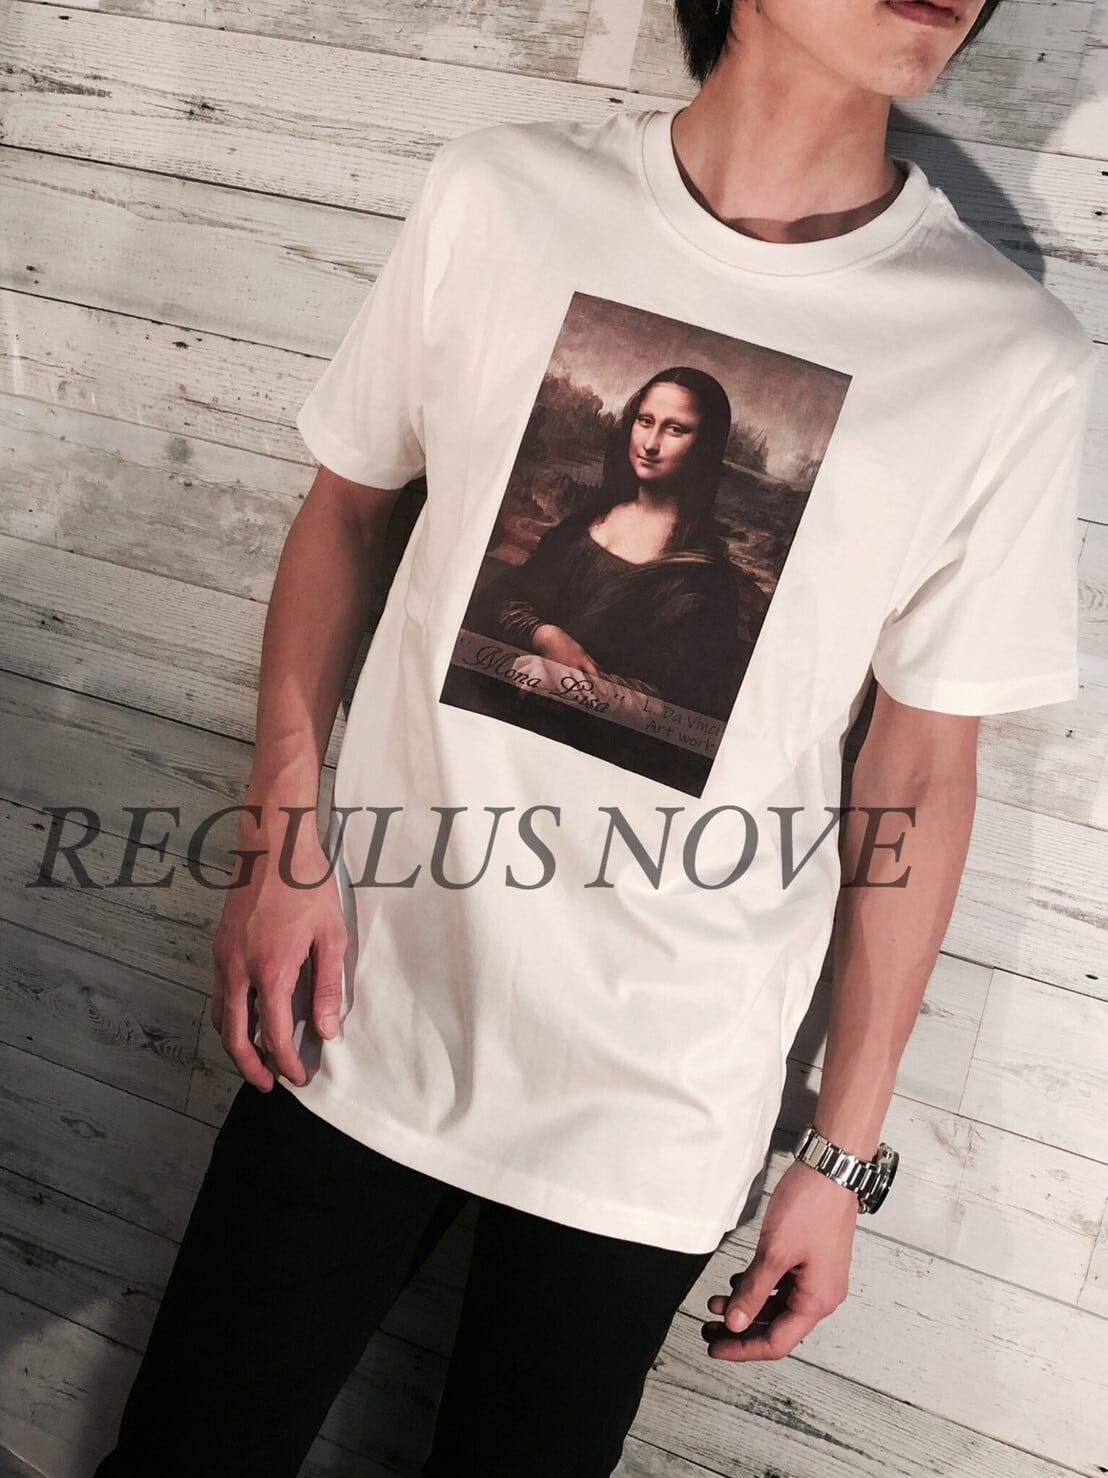 REGULUS NOVE モナ・リザプリントBIGTシャツ ユニセックス レディース メンズ オーバーサイズ 大きいサイズ 派手 個性的 ストリート ロック